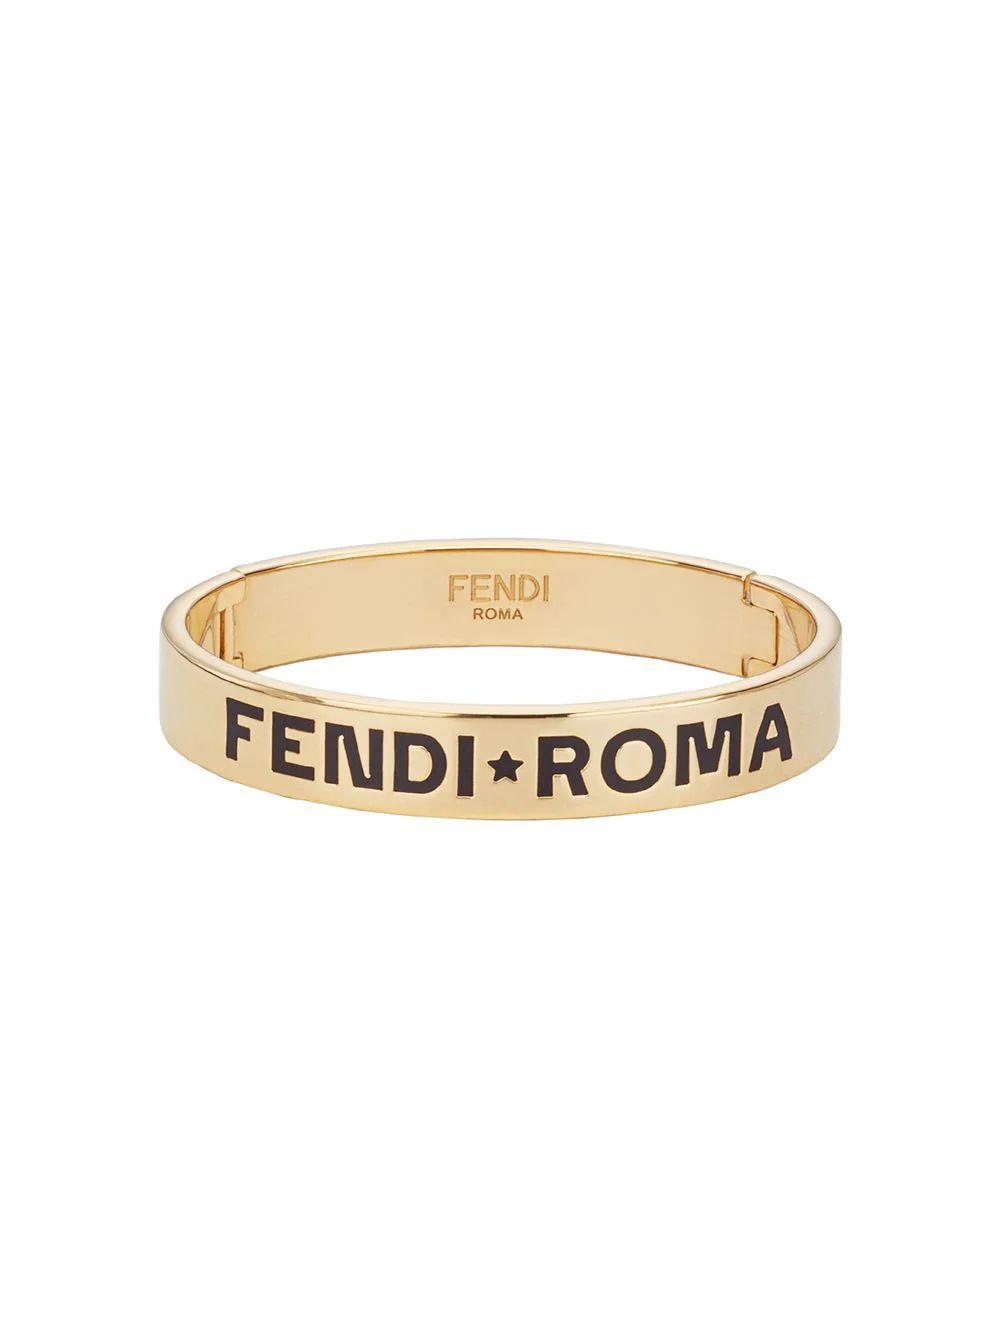 Ff Bracelet Item # 8AG946-B09